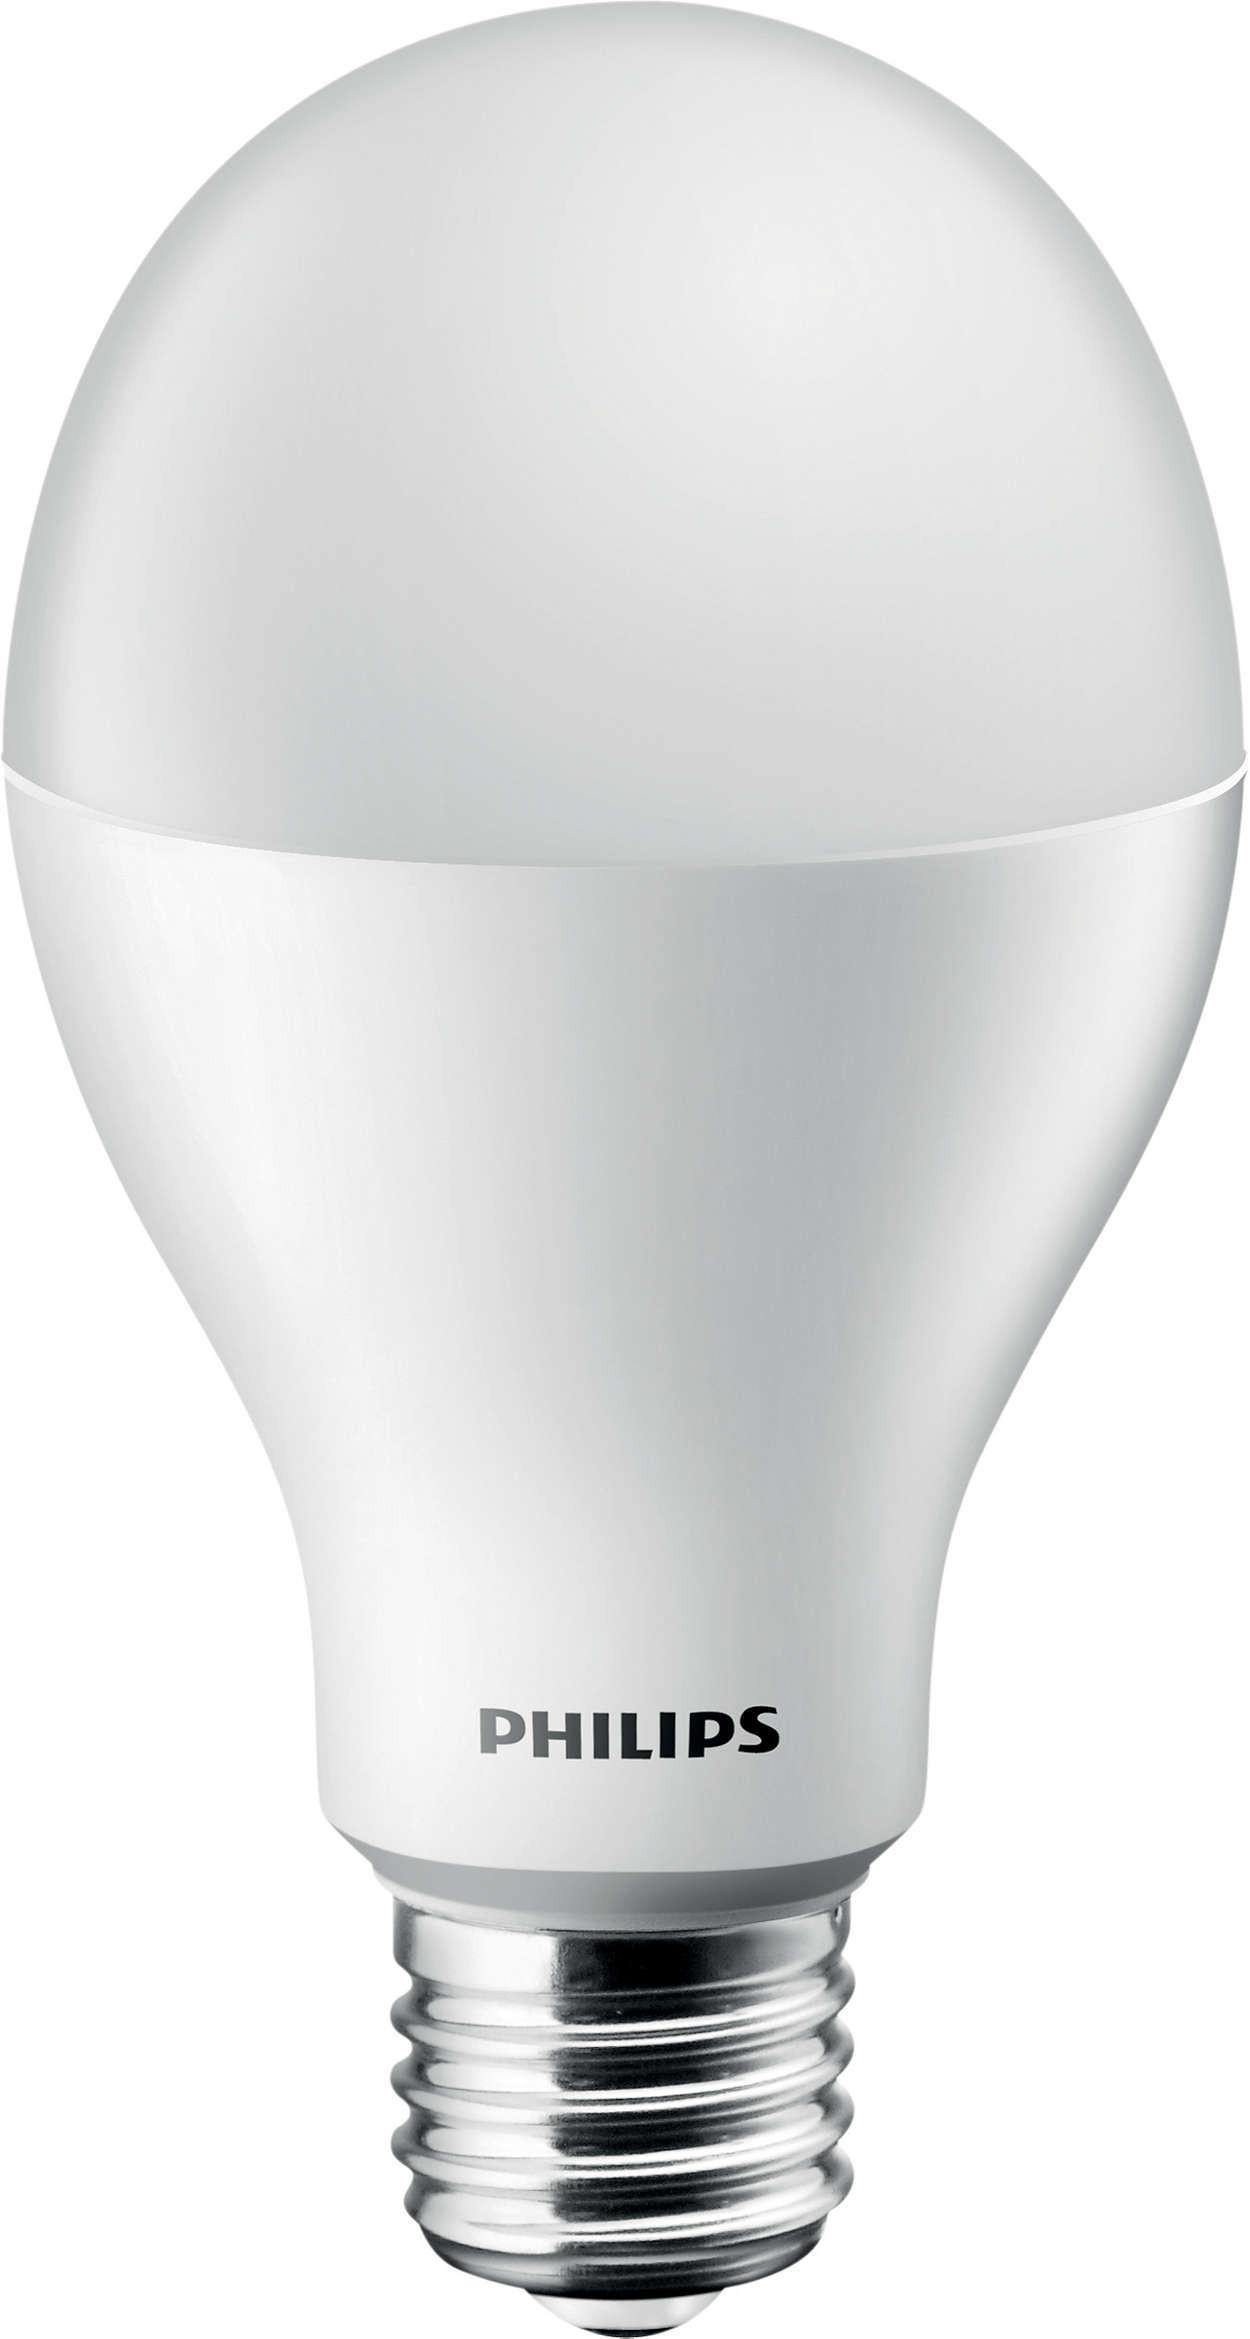 Philips CorePro LEDbulb D 16-100W E27 827